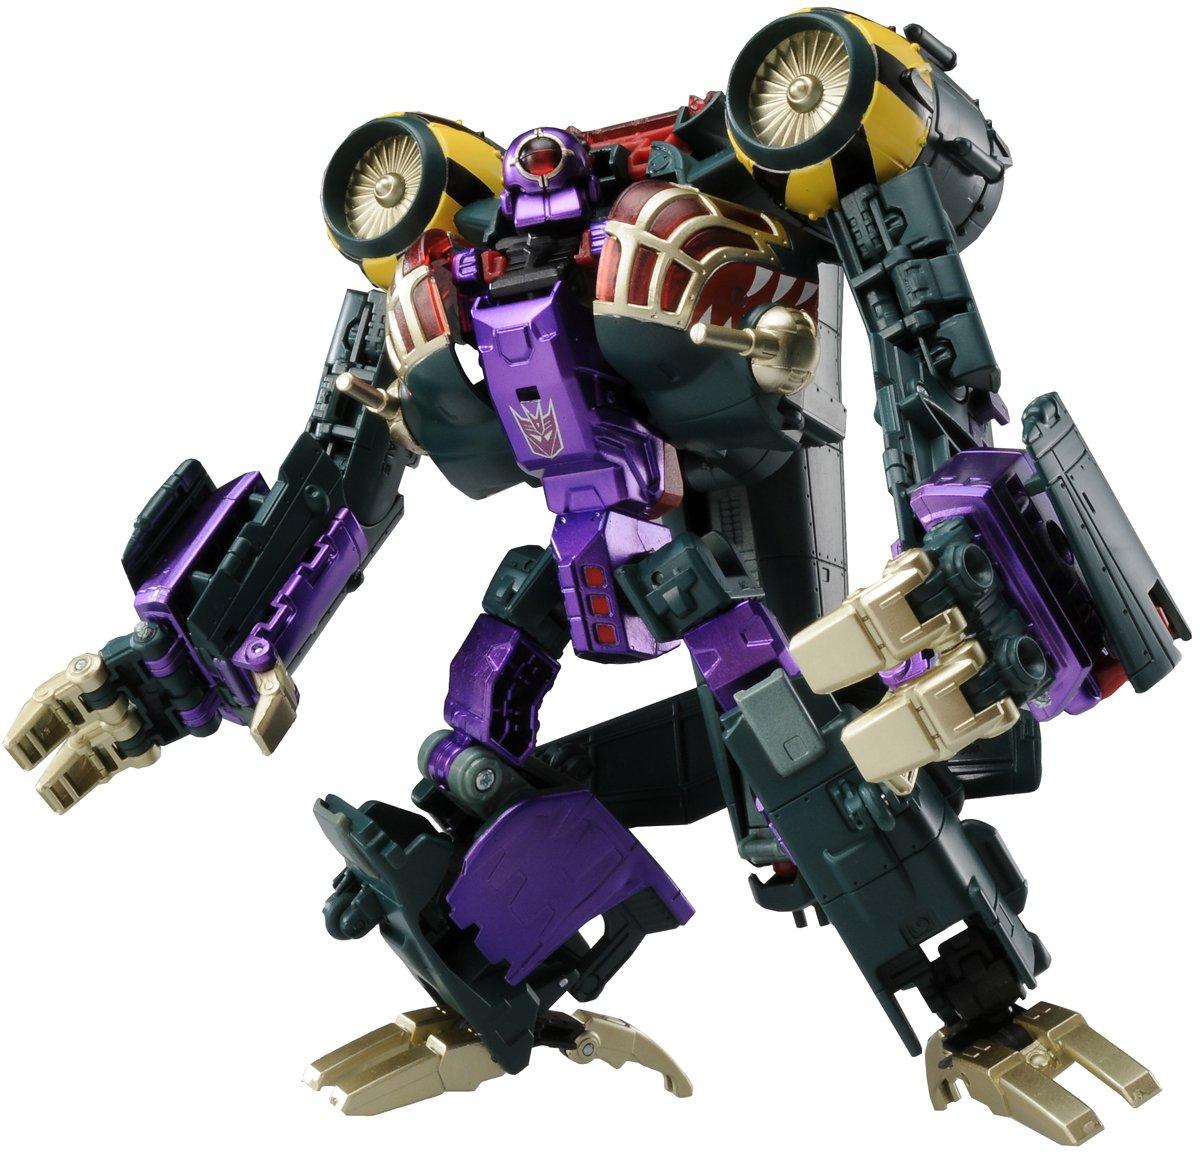 Jouets Transformers Generations: Nouveautés Hasbro - Page 2 1286987206_B0046XR7DA.09.MAIN._SCRMZZZZZZ_